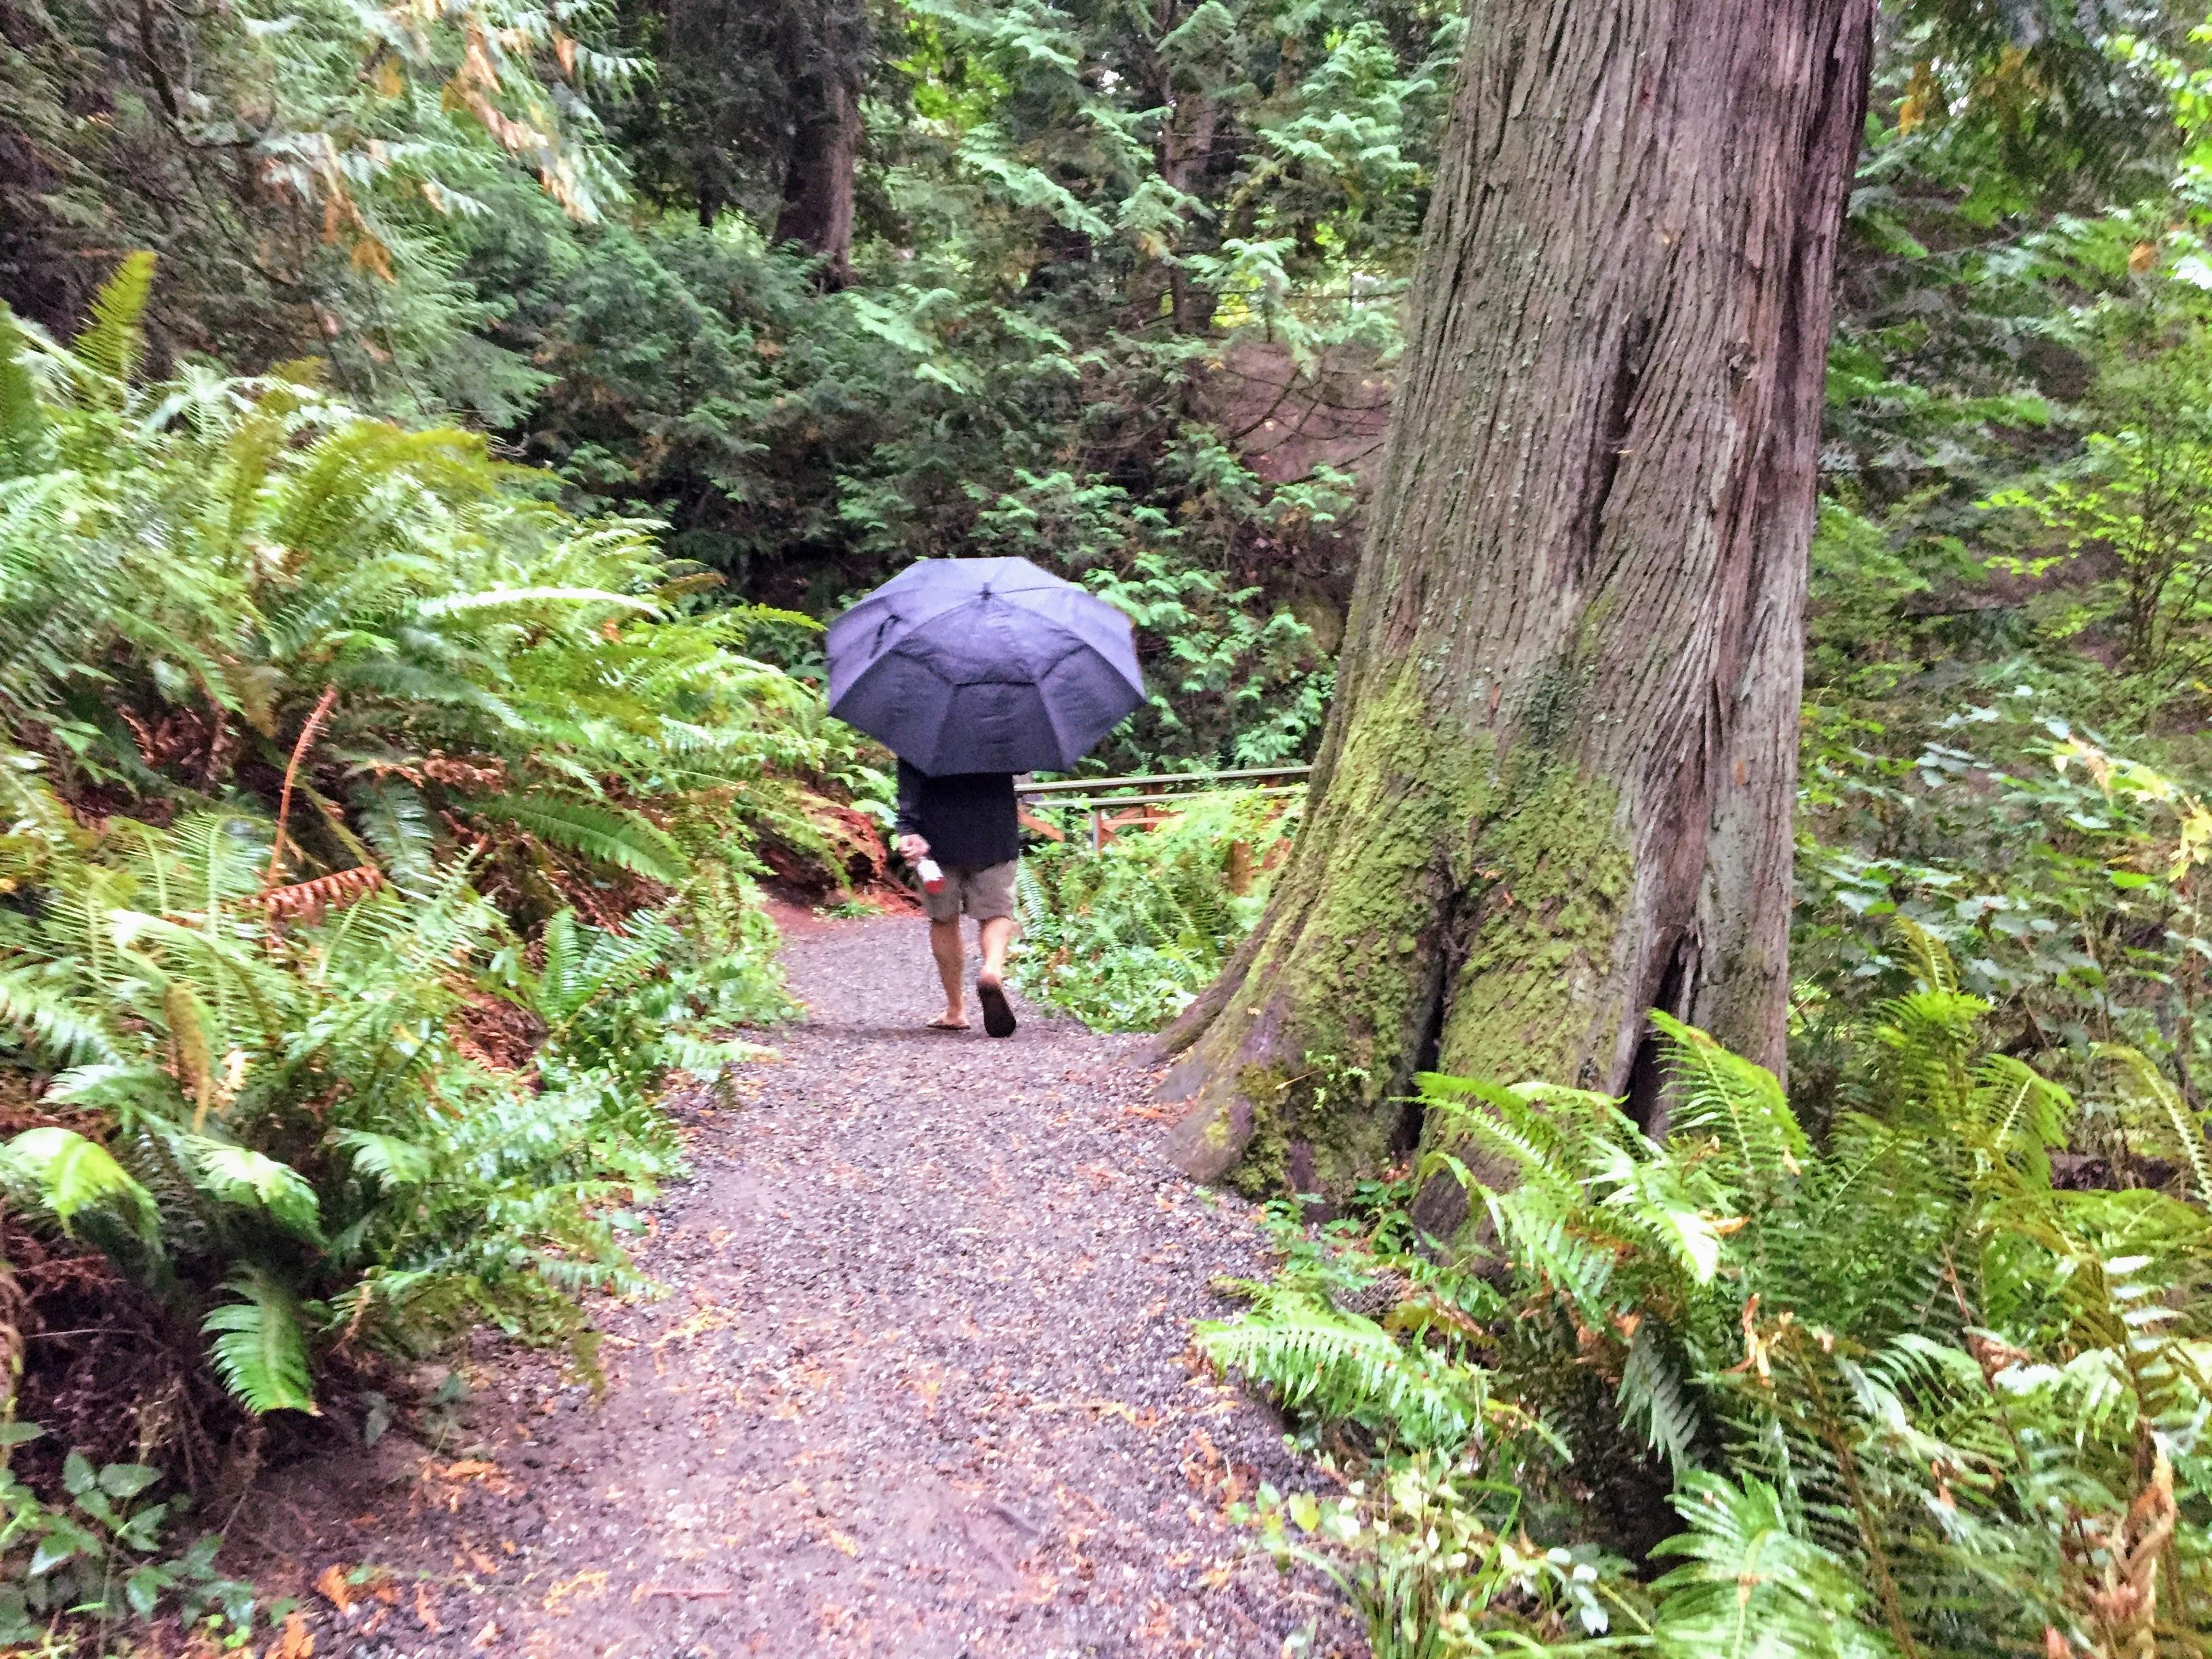 2017-09-25 Washington 01 Larrabee State Park 02